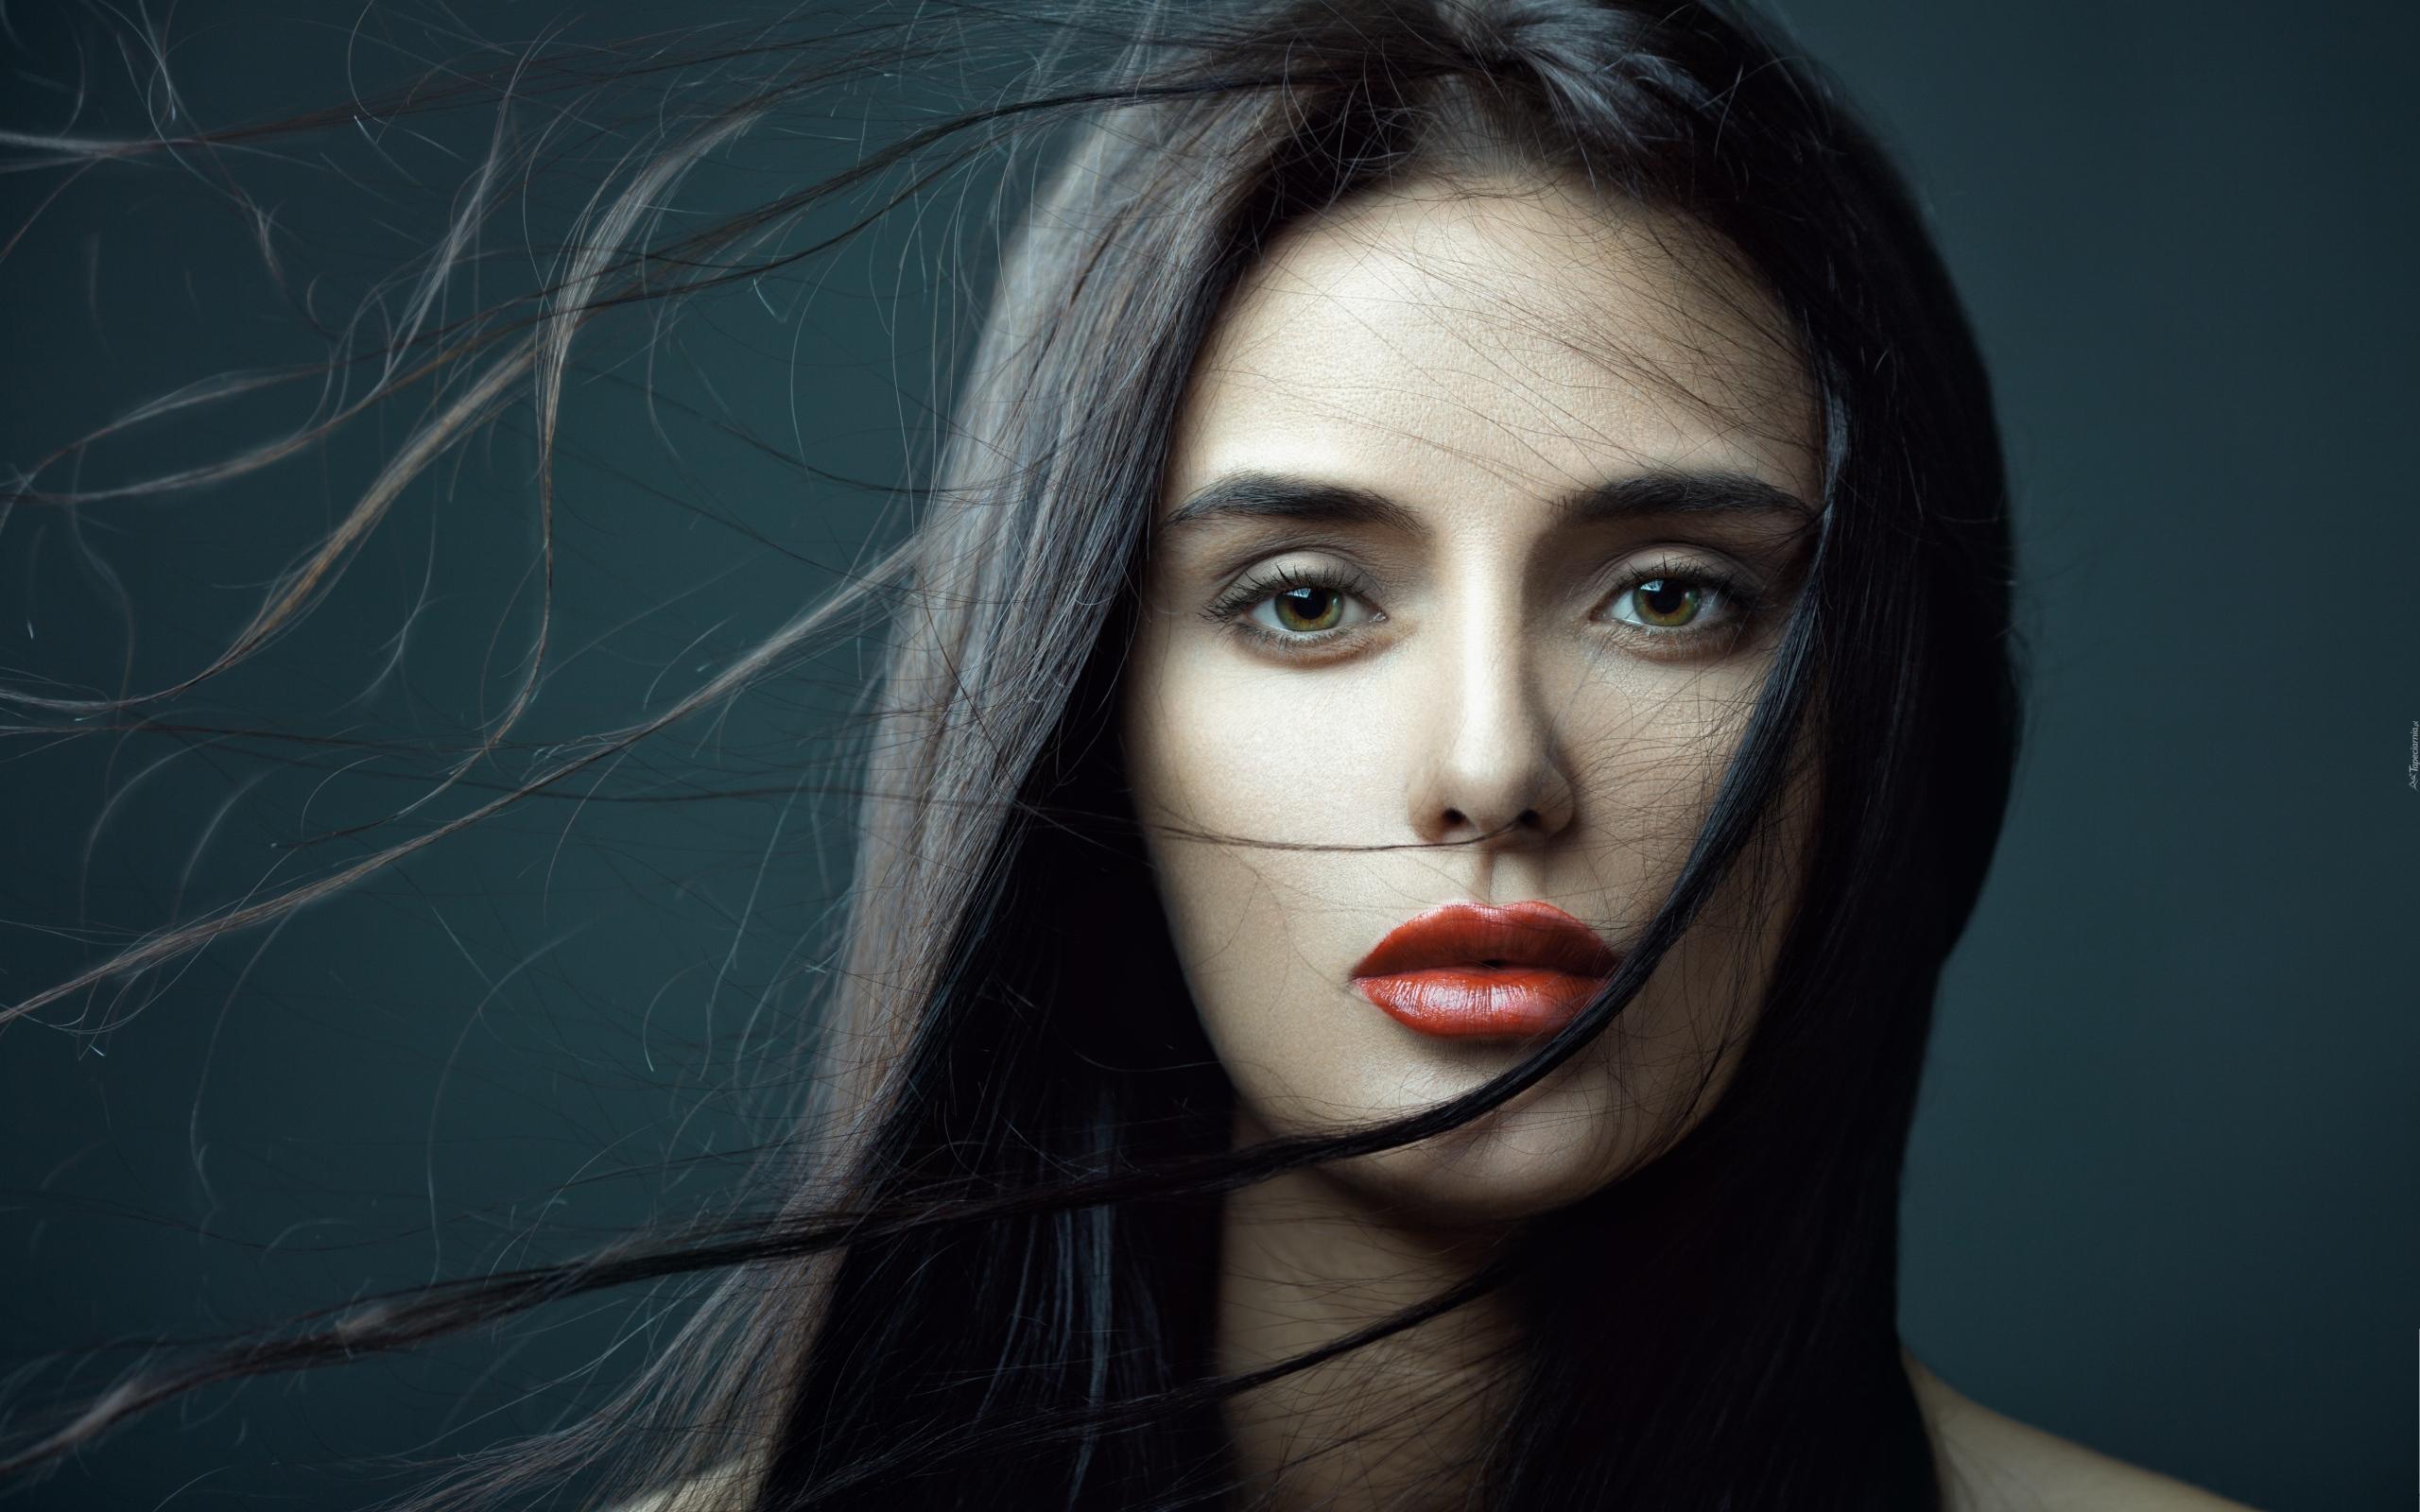 HDoboi.Kiev.ua - Красивая девушка брюнетка, обои на рабочий стол милые девушки